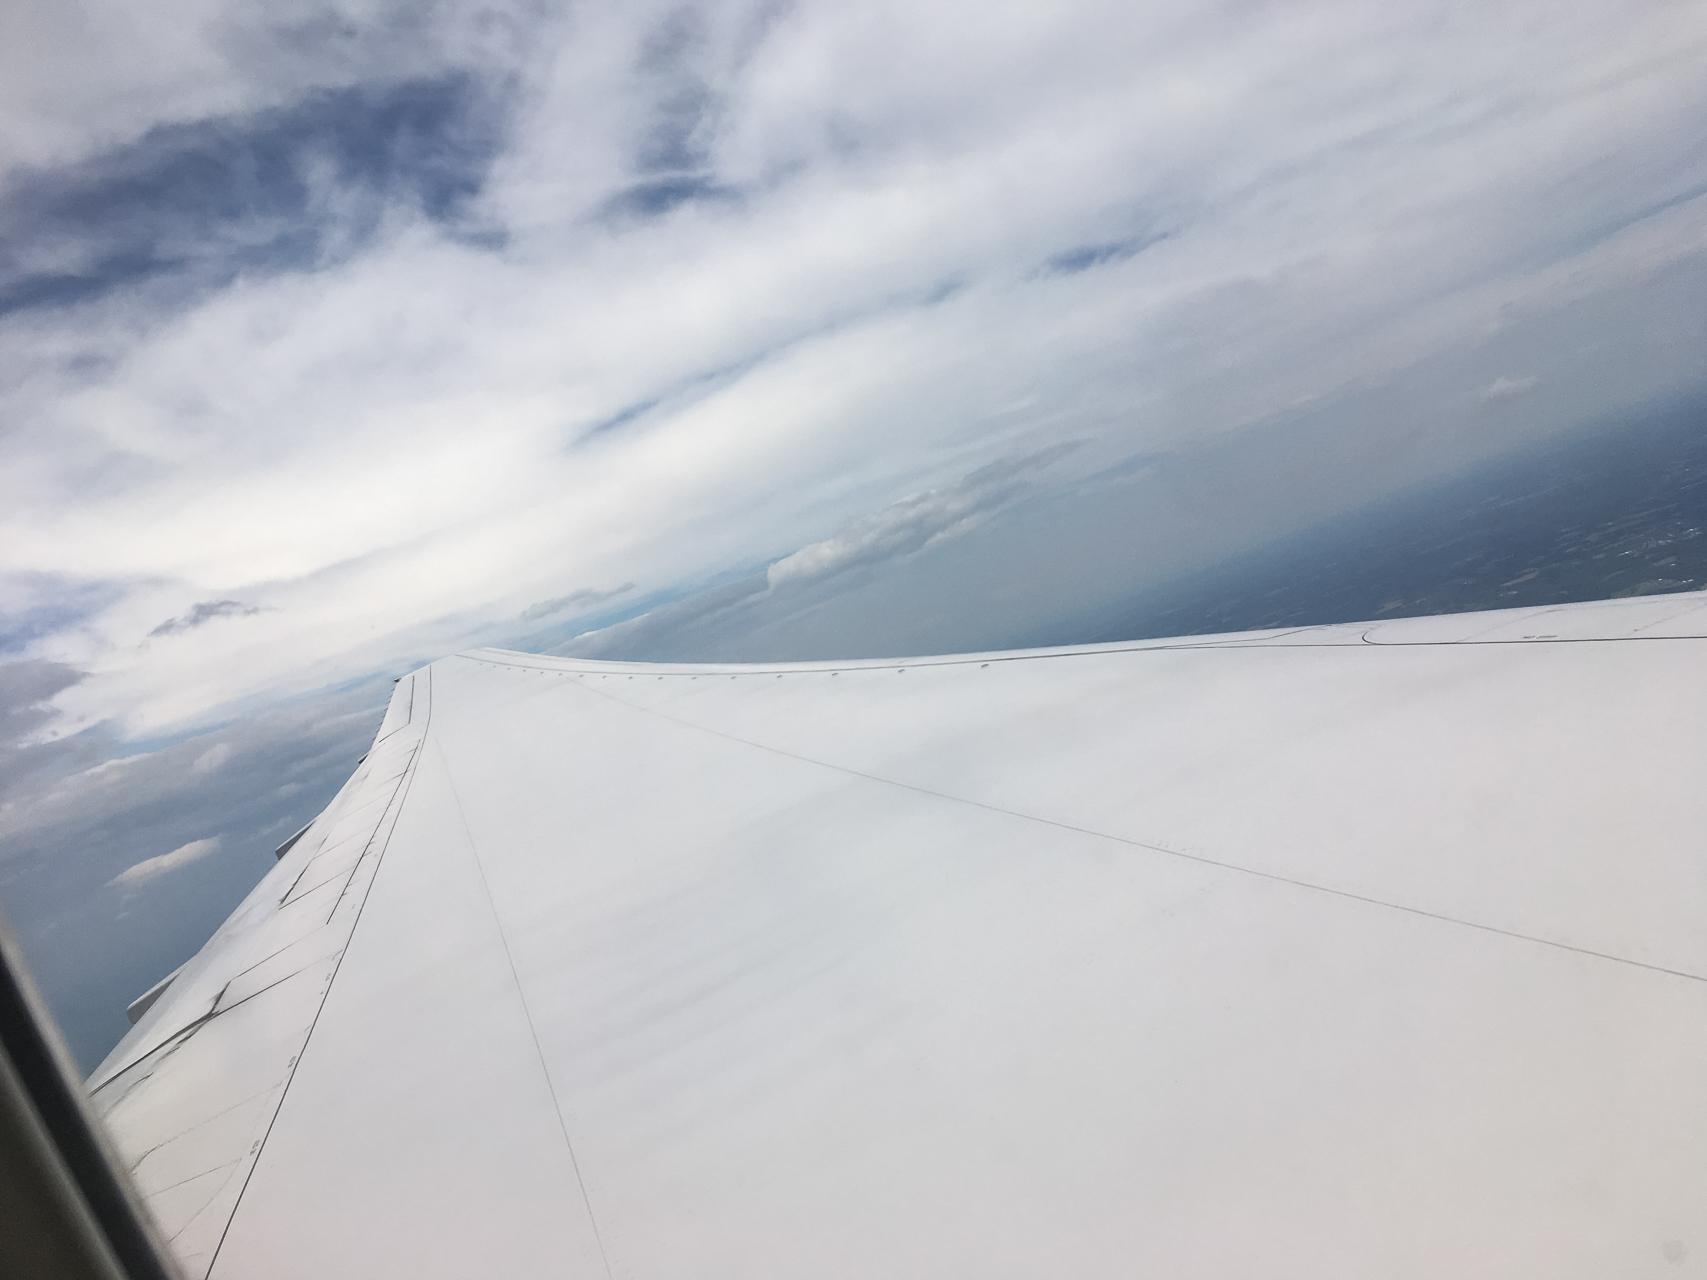 United_Airlines_Wolken_Flora_Jädicke_III